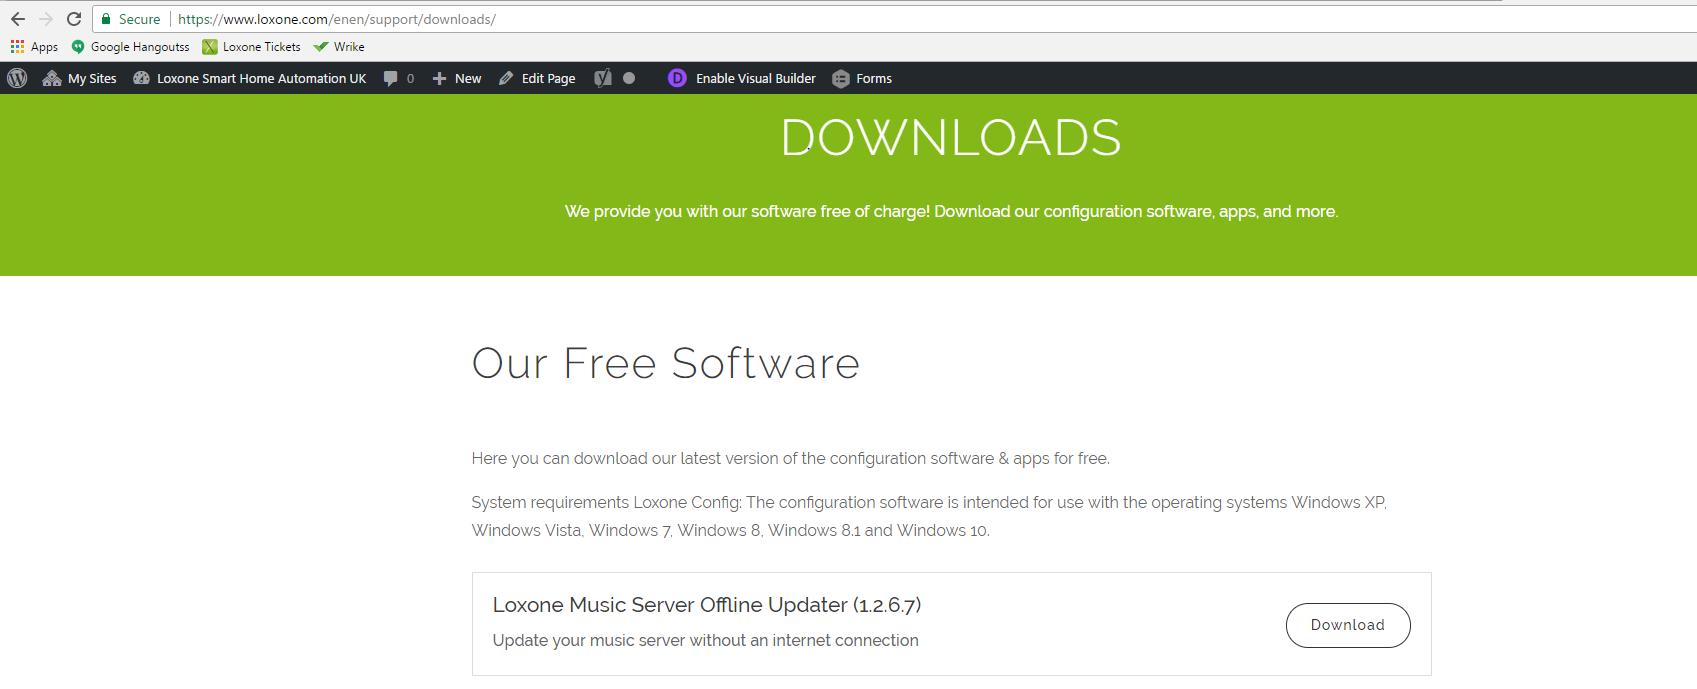 Offline updater downloads - Loxone Smart Home Automation UK